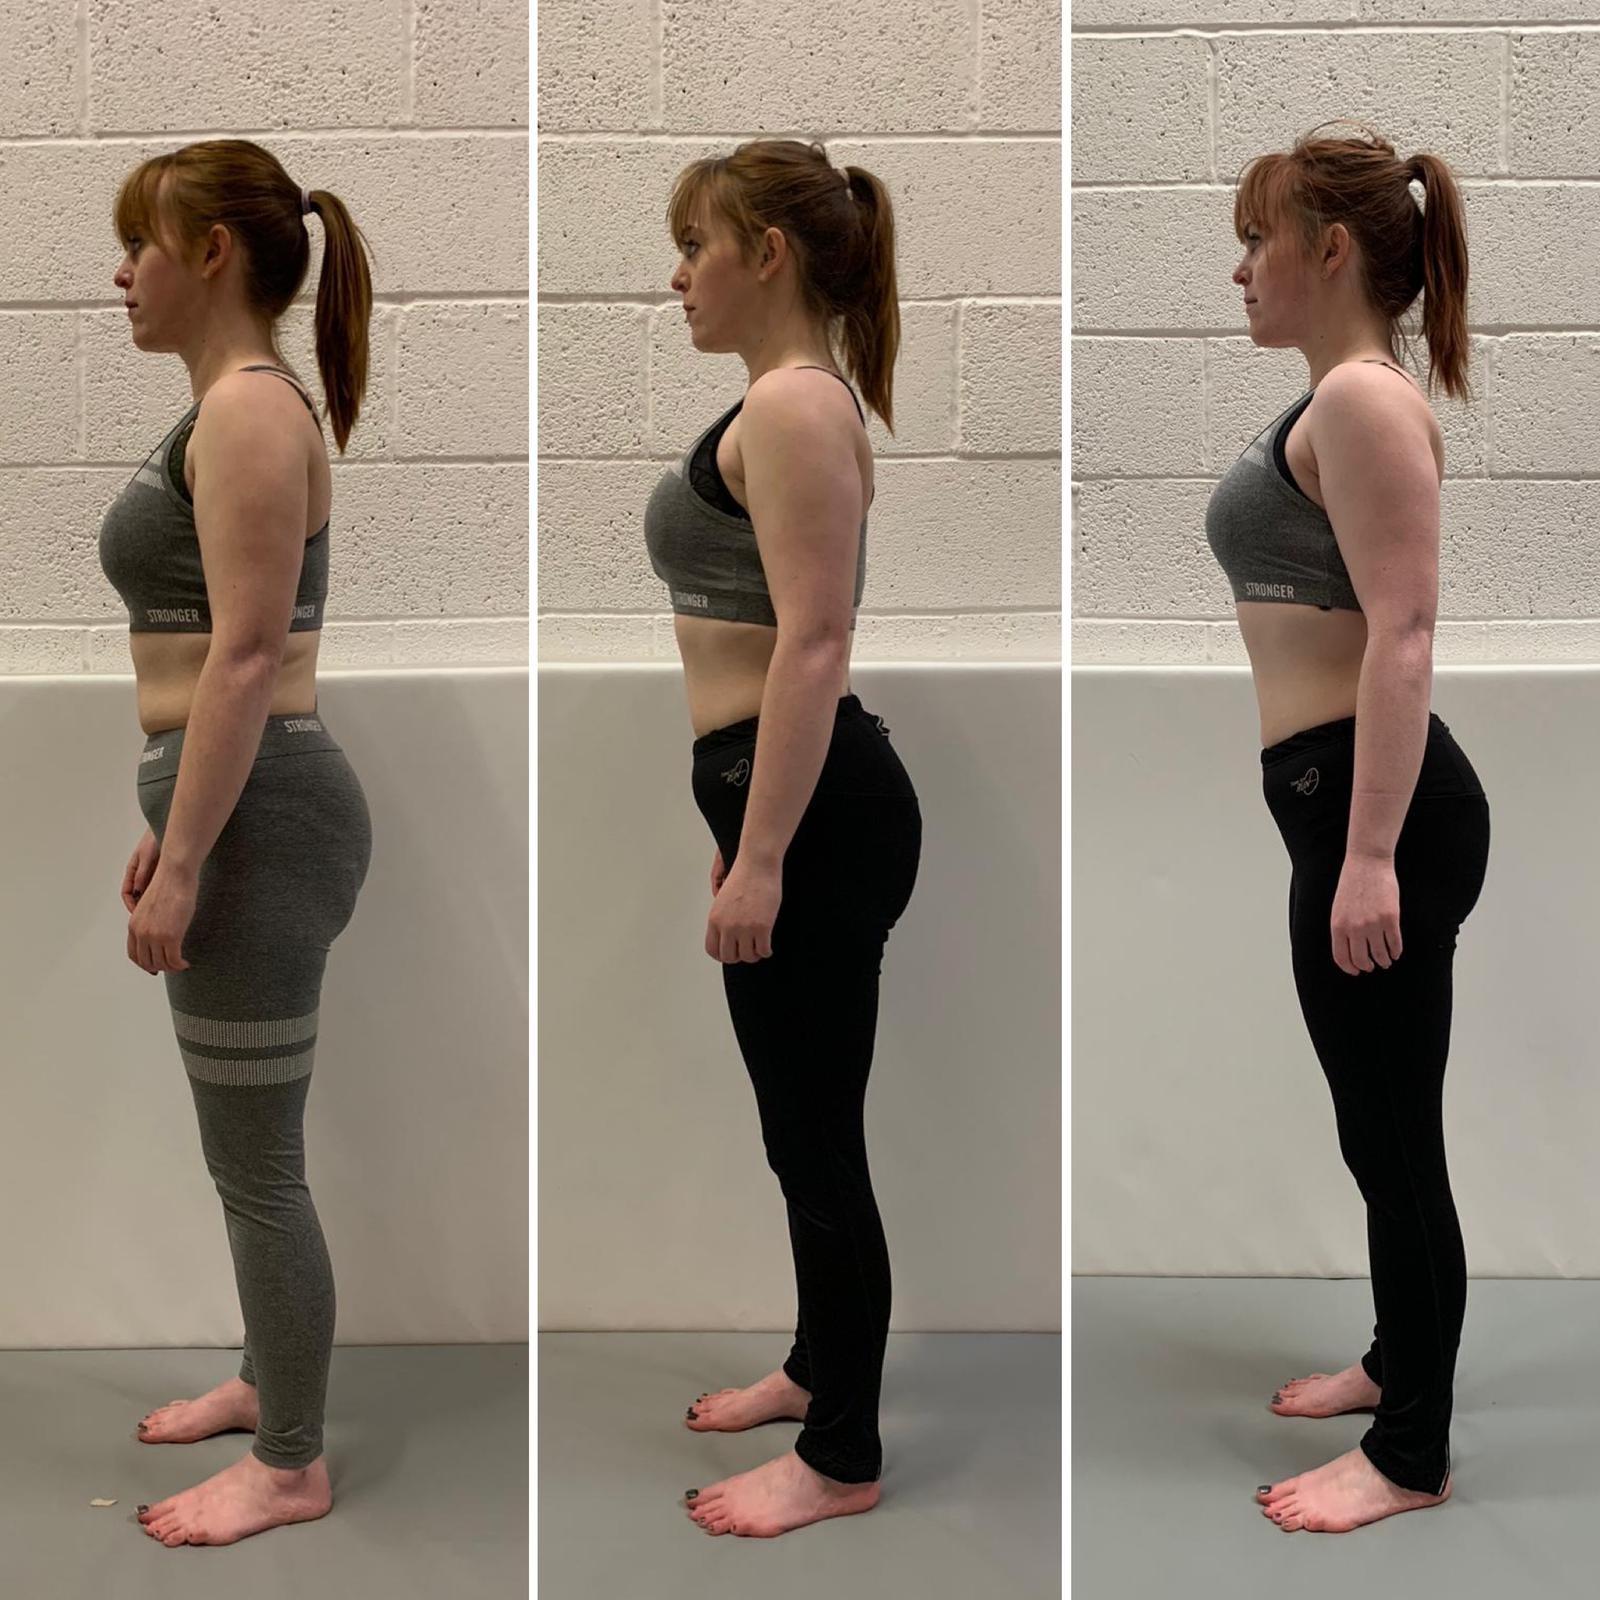 Sarah weight loss progress Primal Life Gym Lincoln